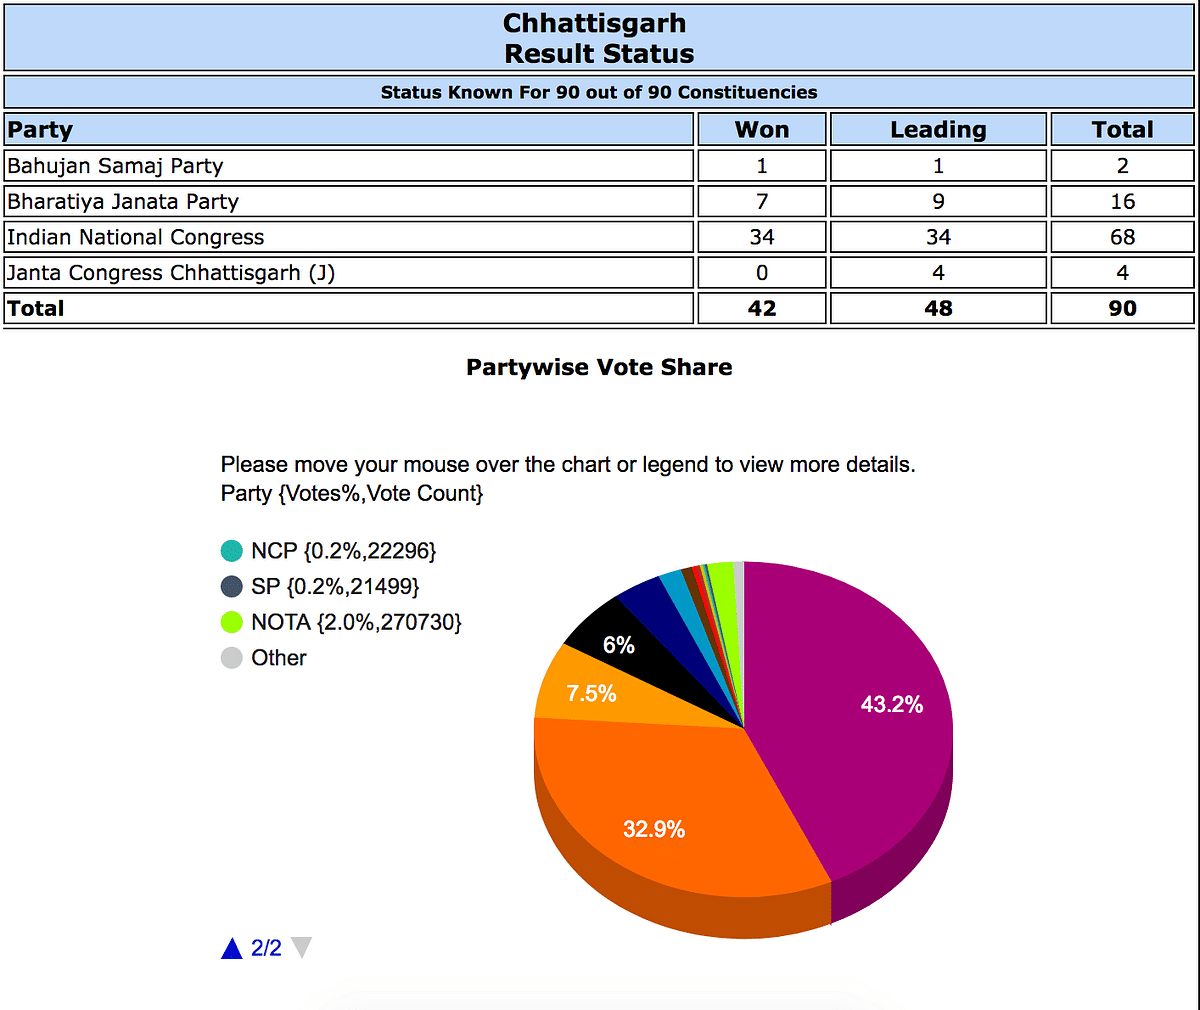 Light green represents NOTA's share in Chhattisgarh. Screen shot at ~10:30 pm, 11 December.